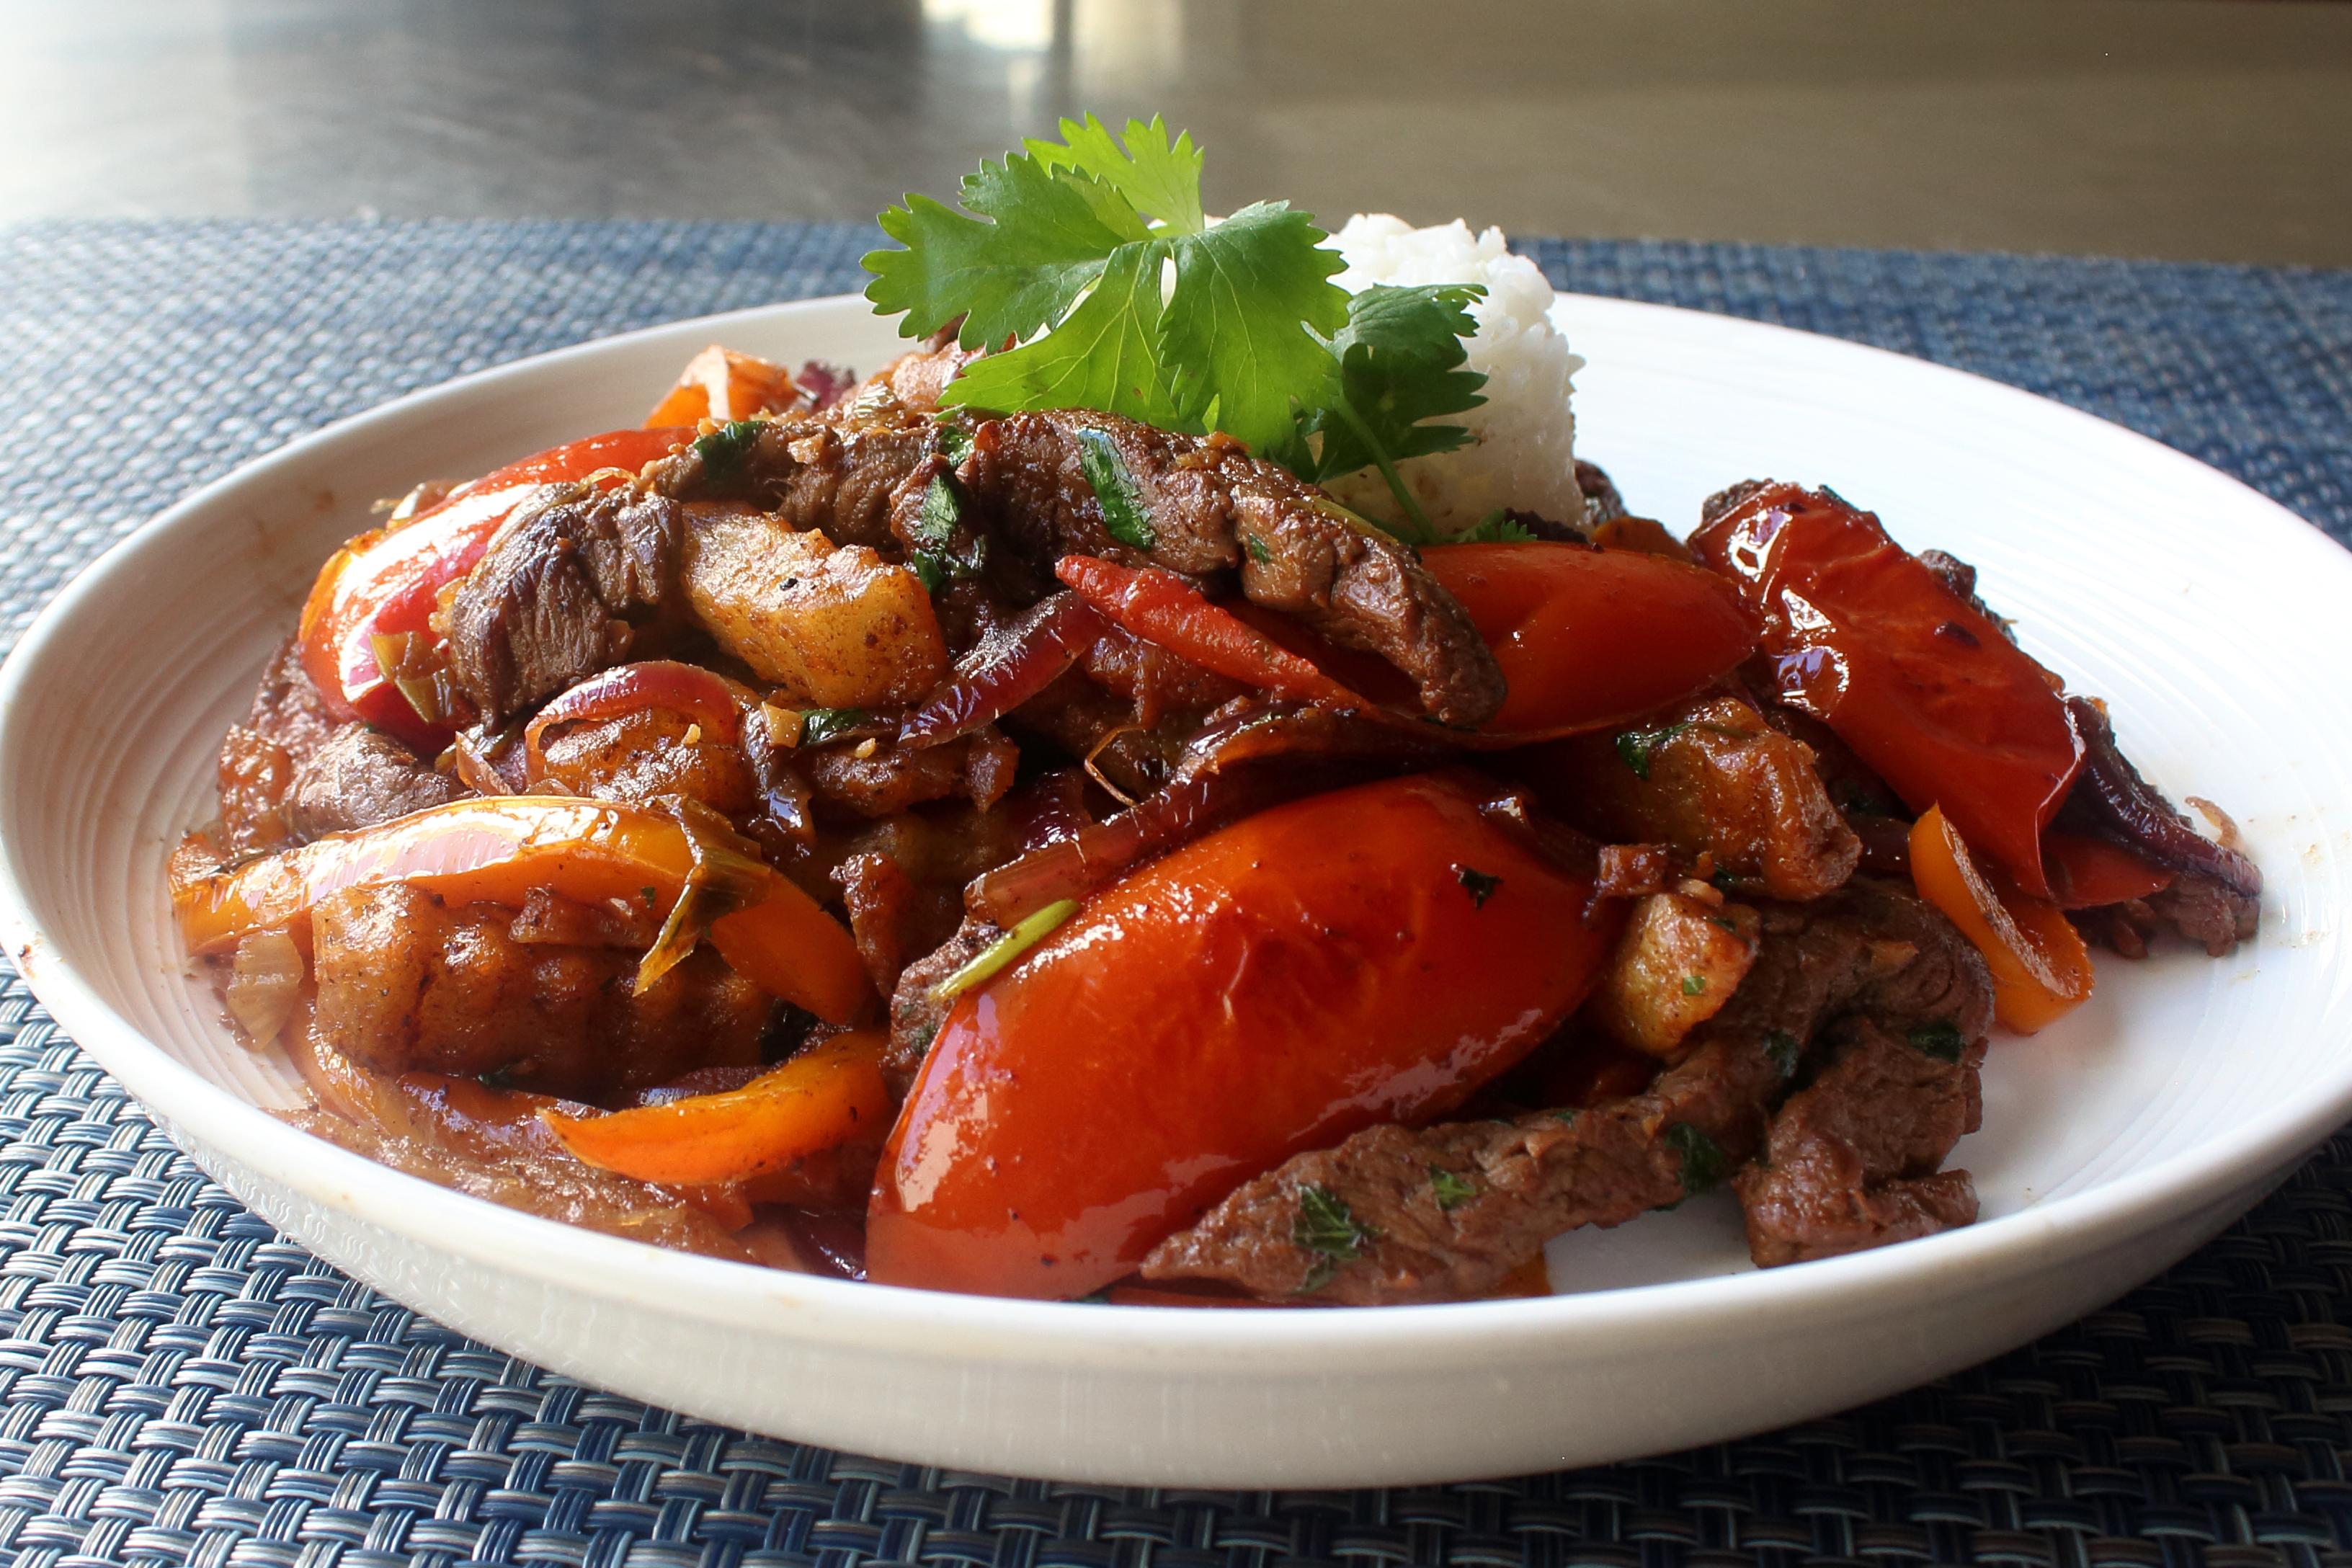 Lomo Saltado (Peruvian Steak Stir-Fry)